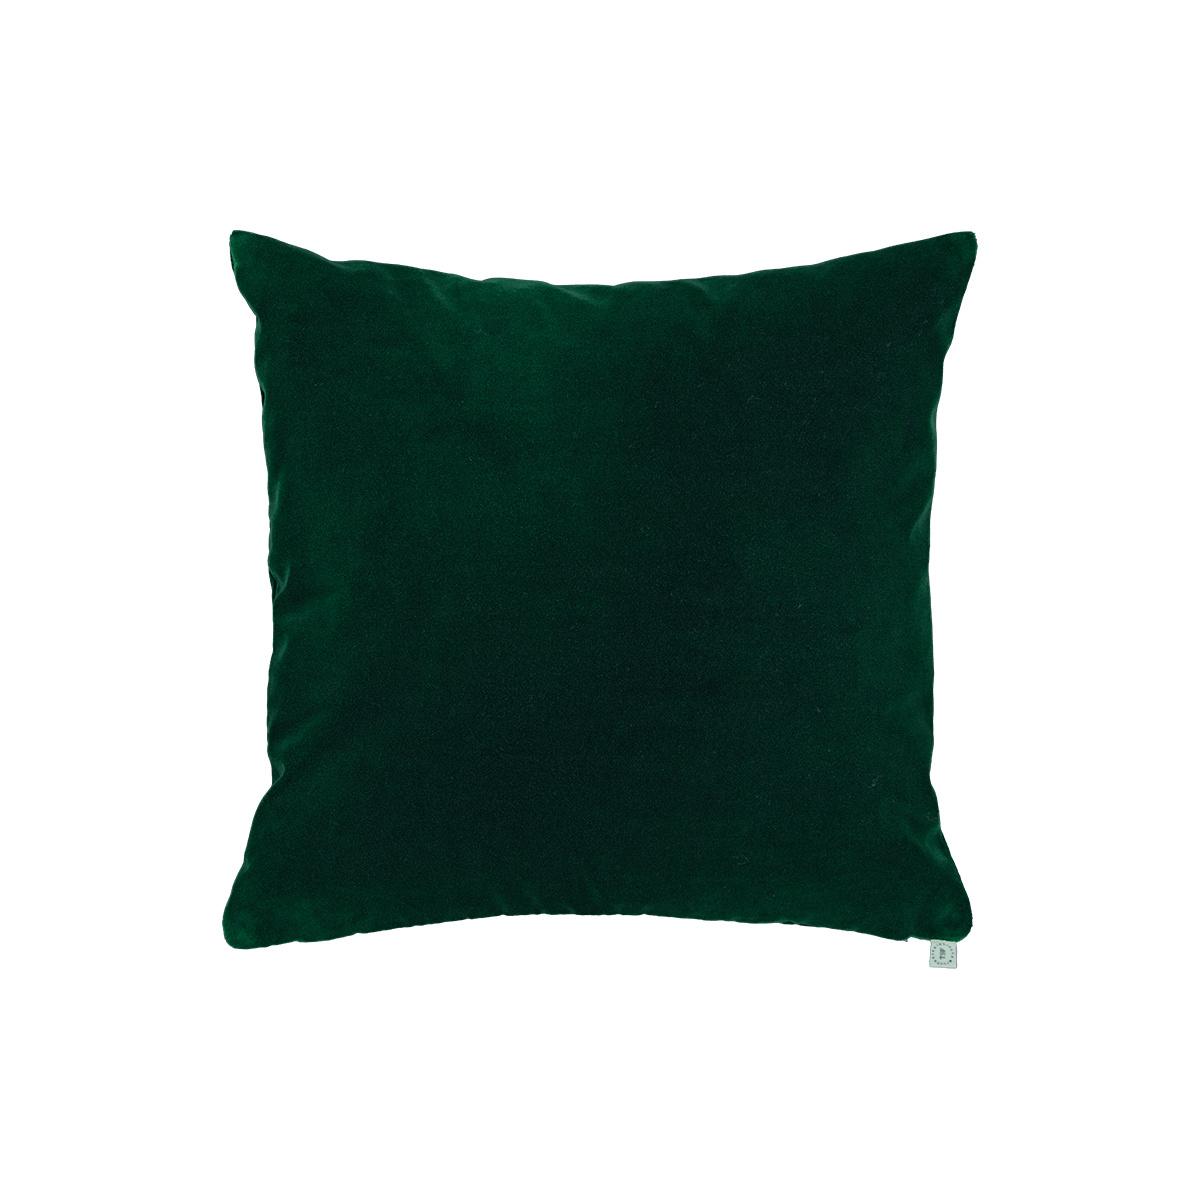 Rotondo Fir Green Velvet Cushion